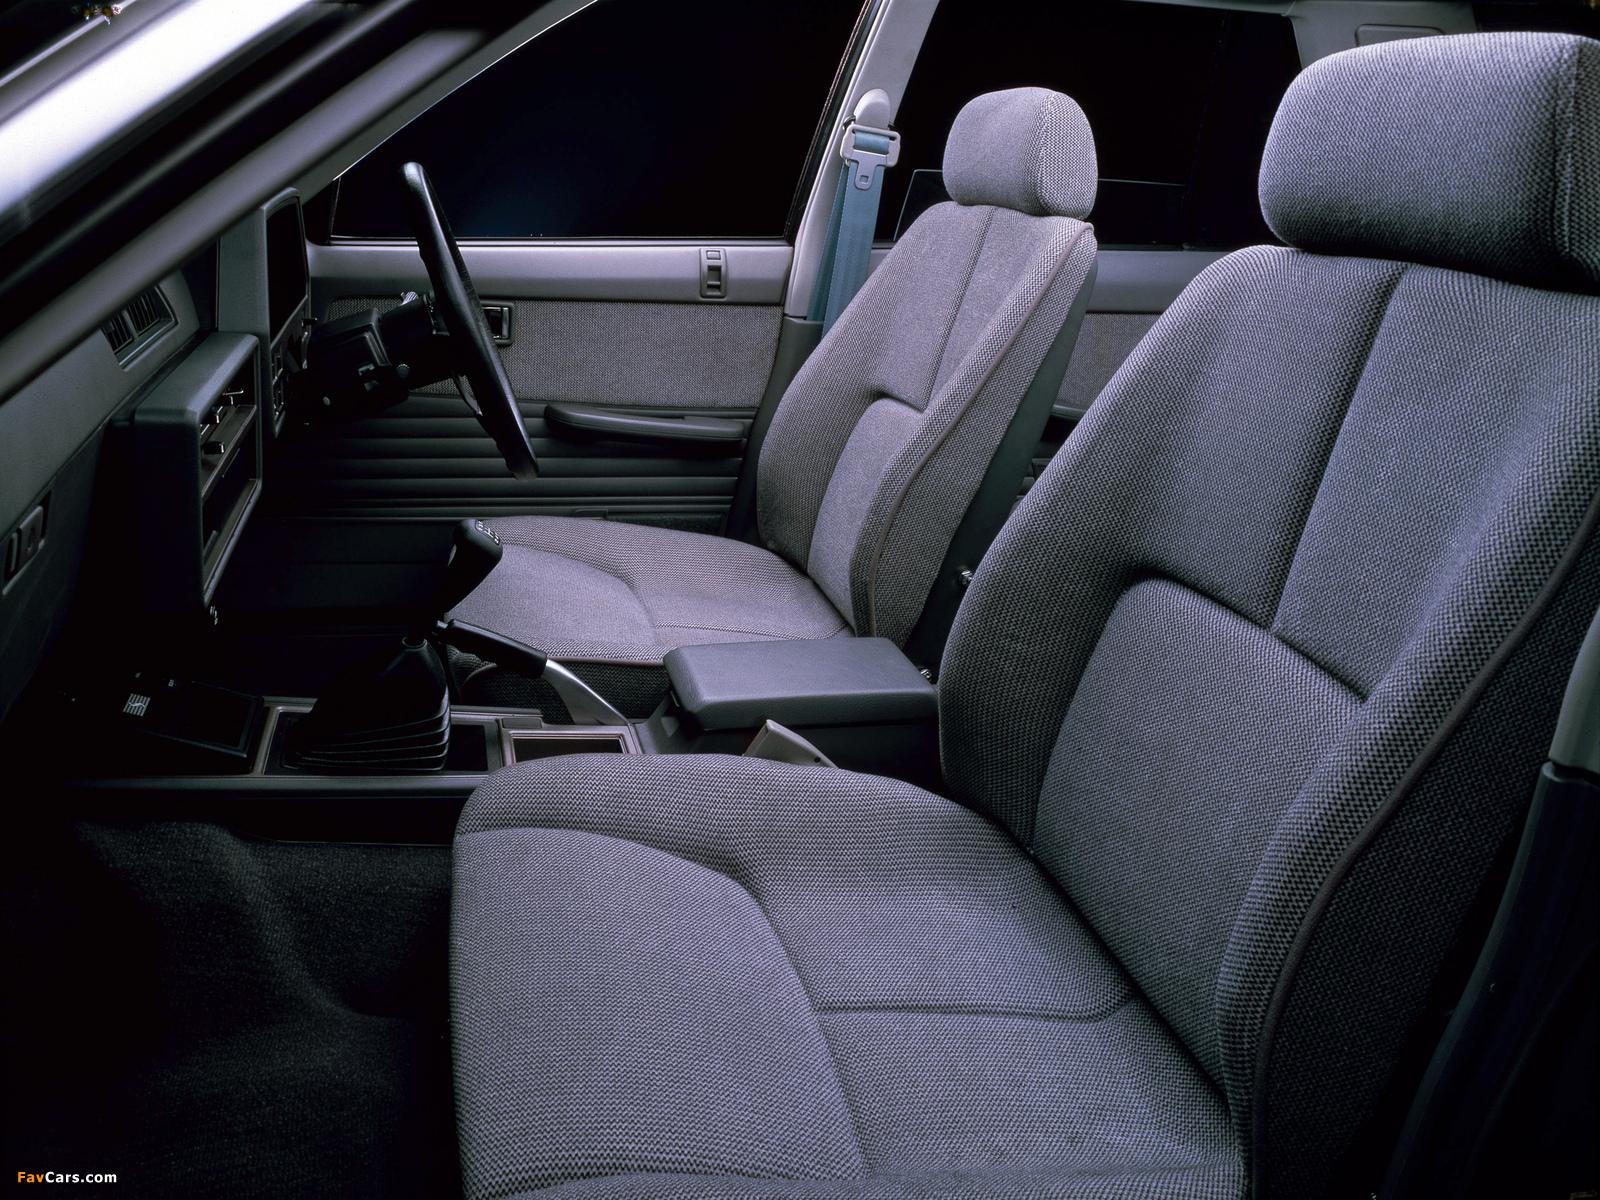 Nissan Skyline 2000 Turbo RS Sedan (DR30JFT) 1983 photos (1600 x 1200)